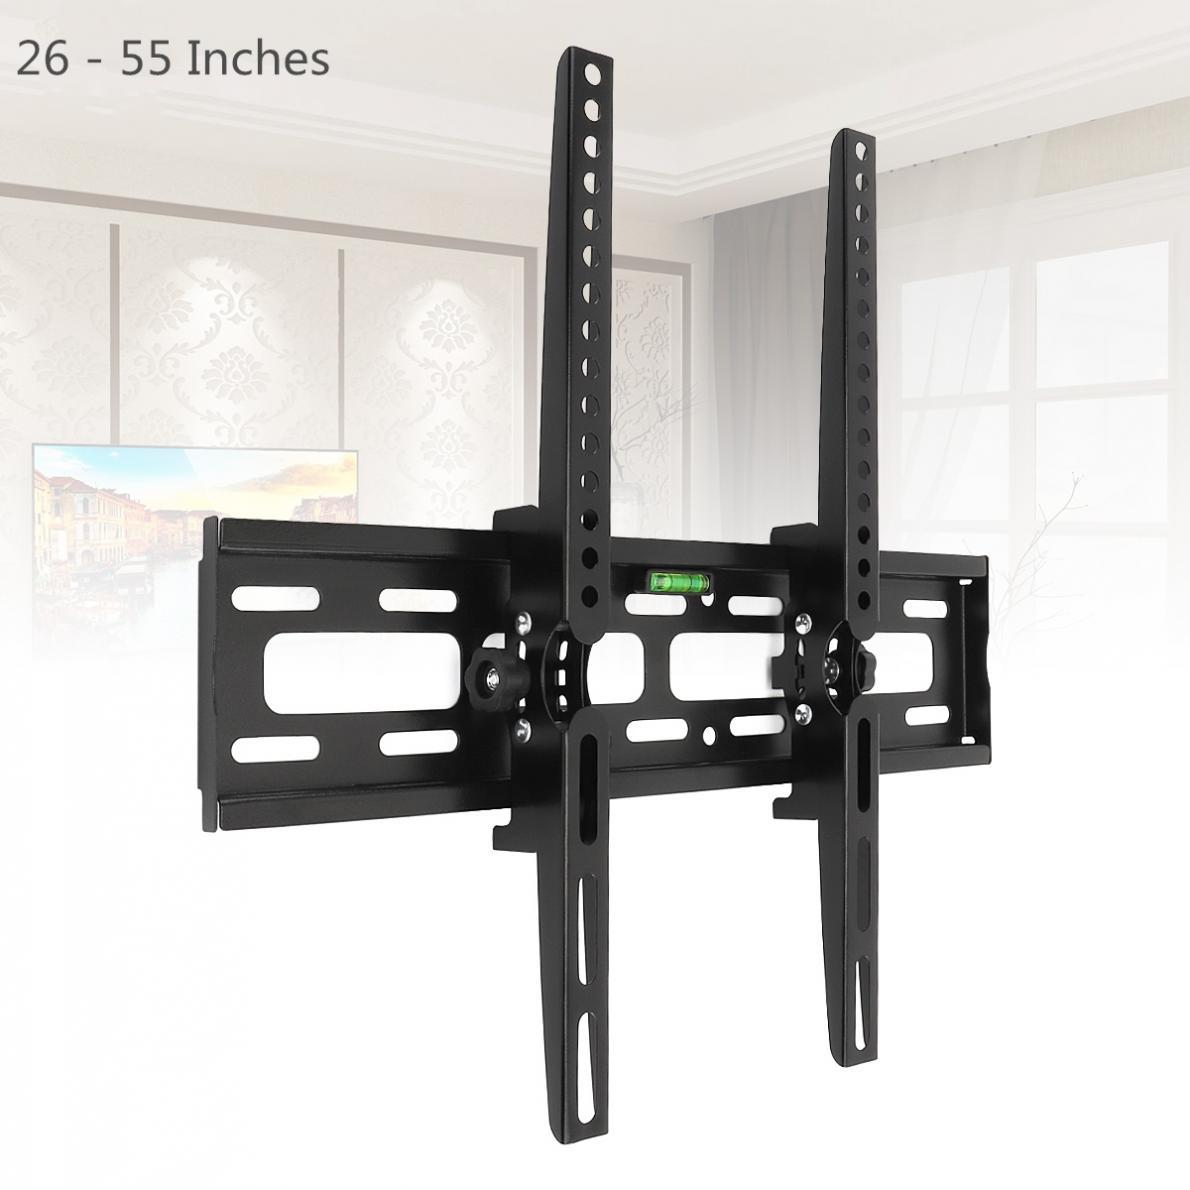 Universal 30KG Adjustable TV Wall Mount Bracket Flat Panel TV Frame Support 15 Degrees Tilt with Level for 26 - 55 Inch LCD LED